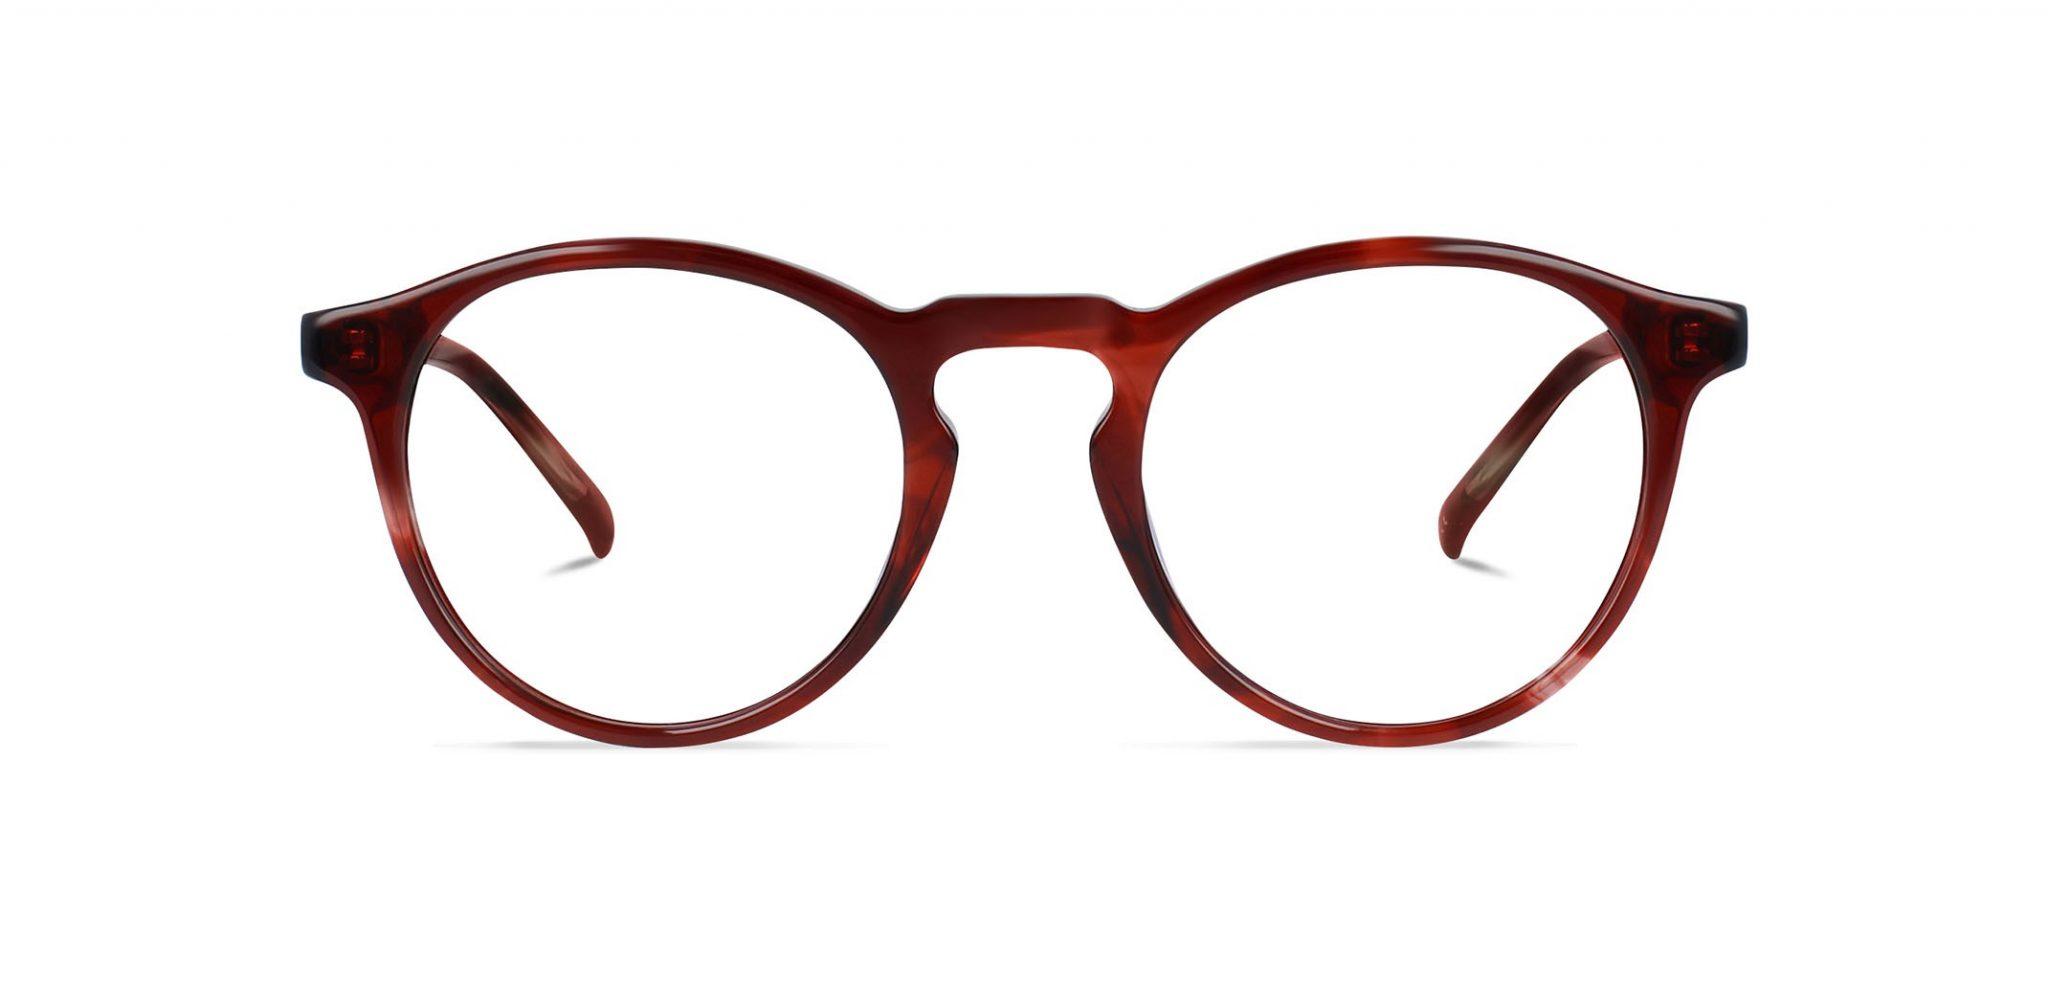 DiKA eyewear – Napoli